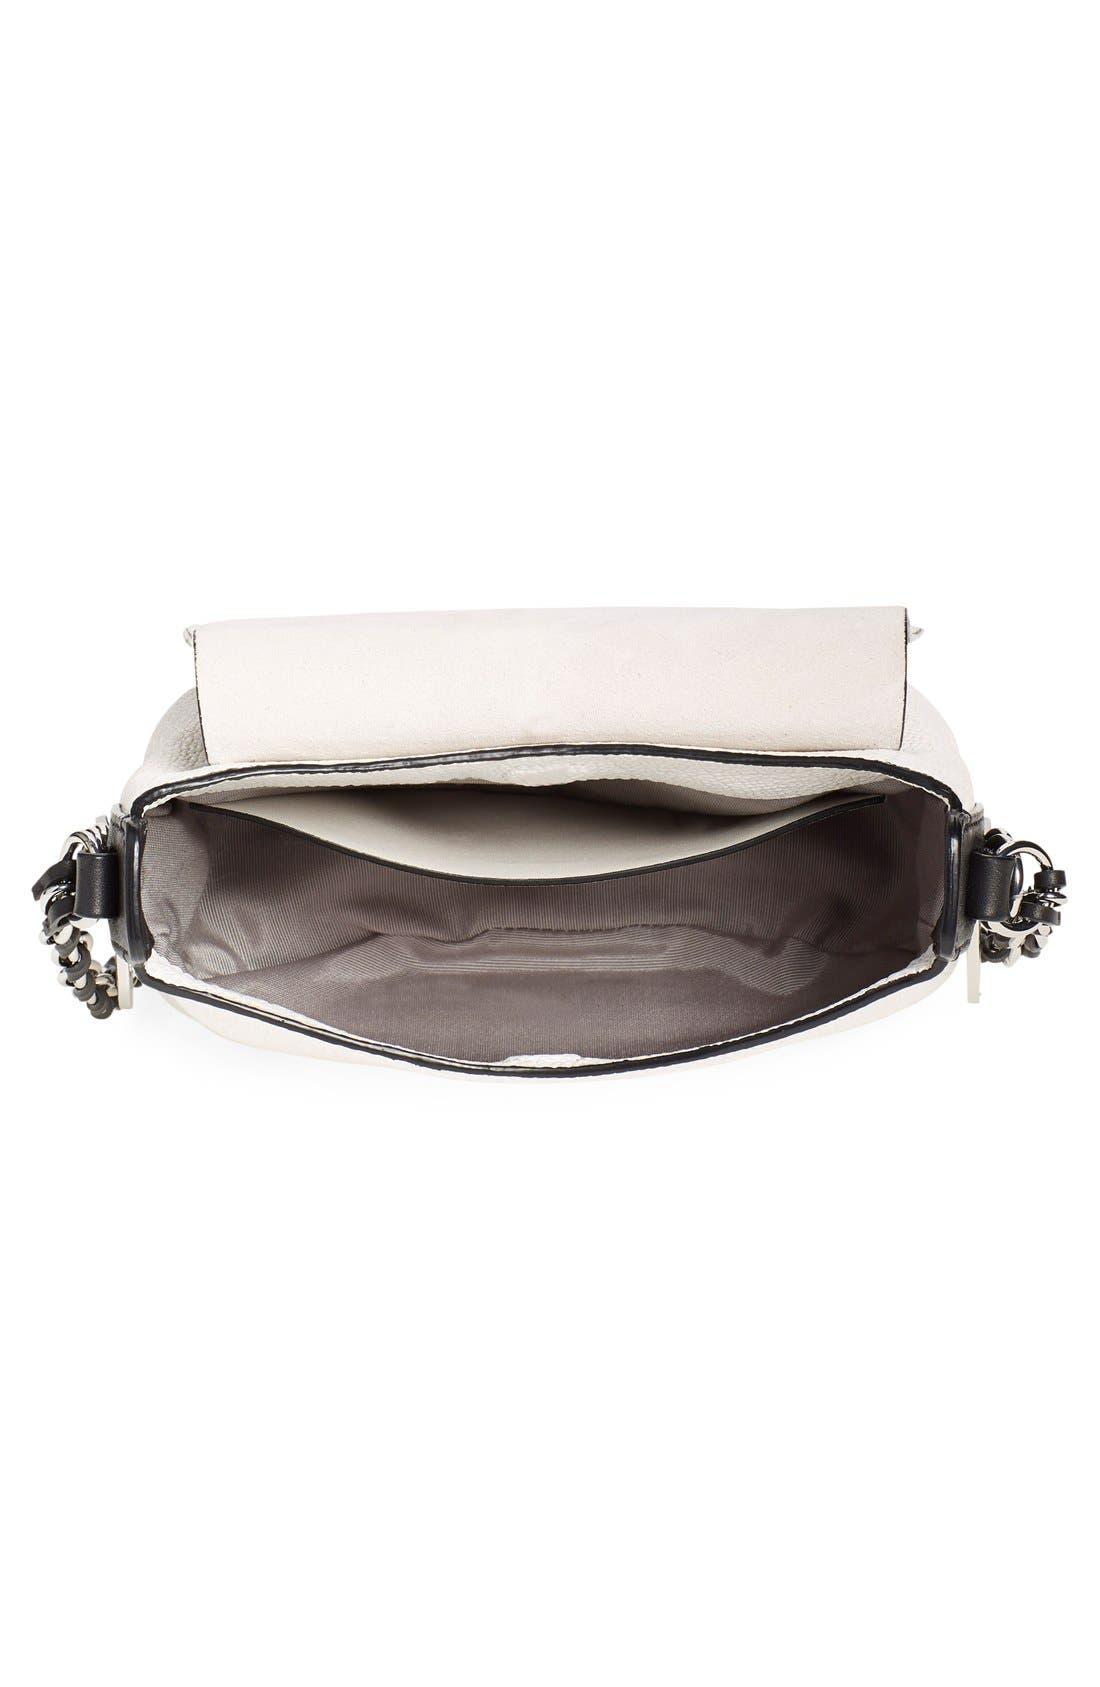 Alternate Image 3  - rag & bone 'Mini Bradbury' Leather Hobo